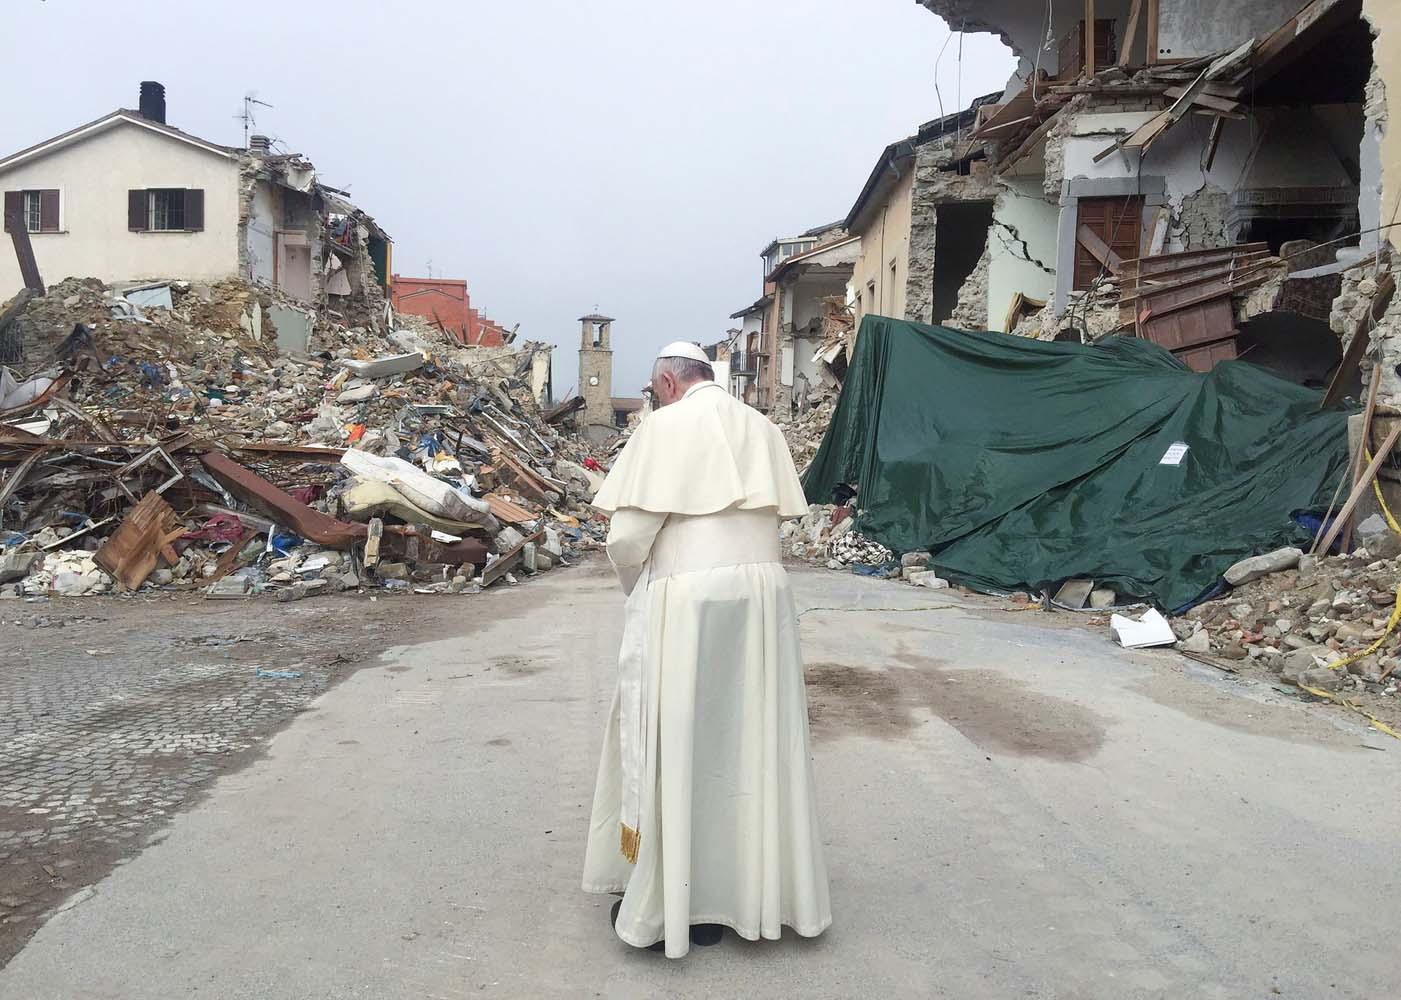 2016-10-04T091136Z_18020115_S1BEUEZVGQAA_RTRMADP_3_POPE-AMATRICE-QUAKE